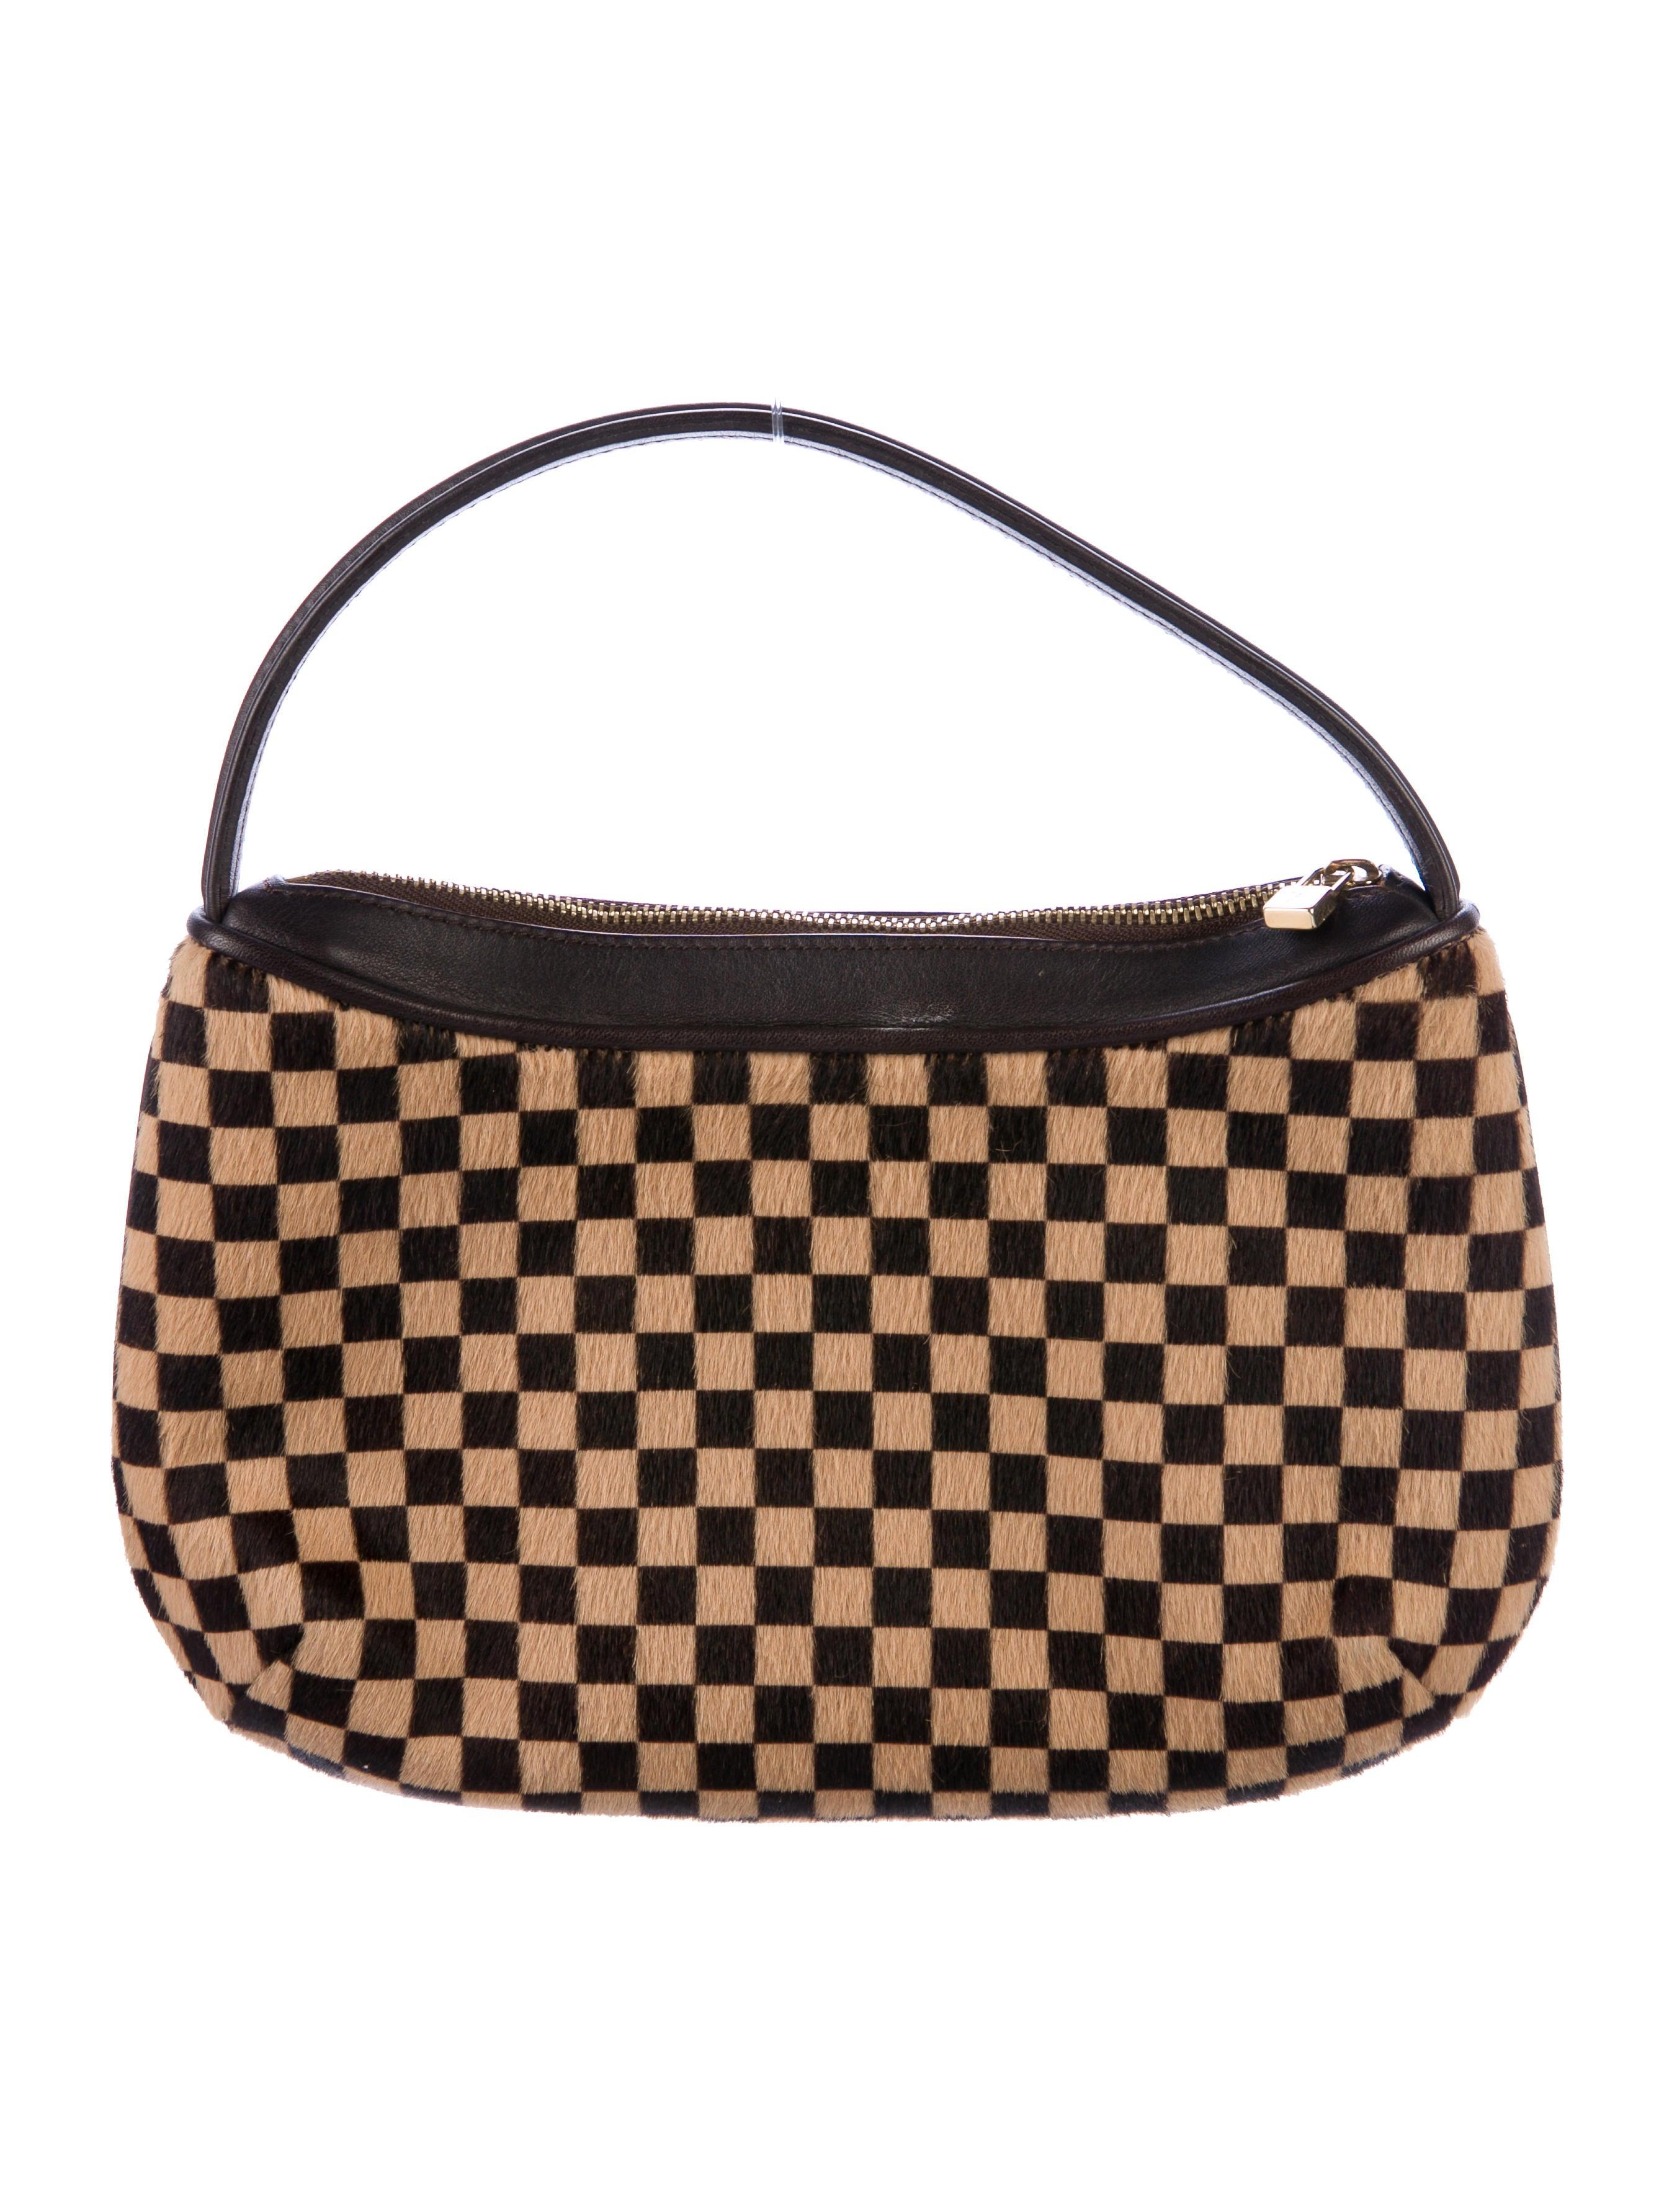 9aee70e58324 Louis Vuitton Damier Sauvage Tigre Bag - Handbags - LOU139351